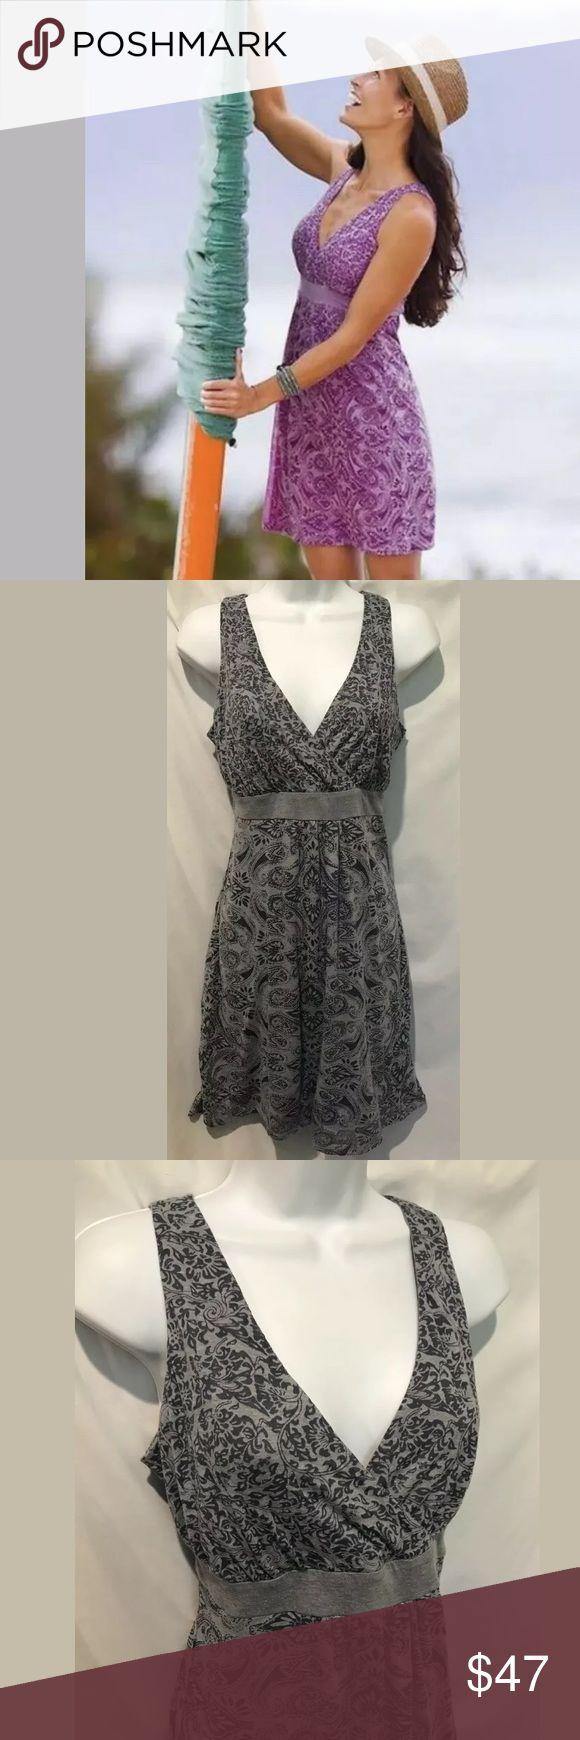 Gray ATHLETA Las Palmas Dress Paisley Vneck Knit This is a Fabulous ATHLETA Las …